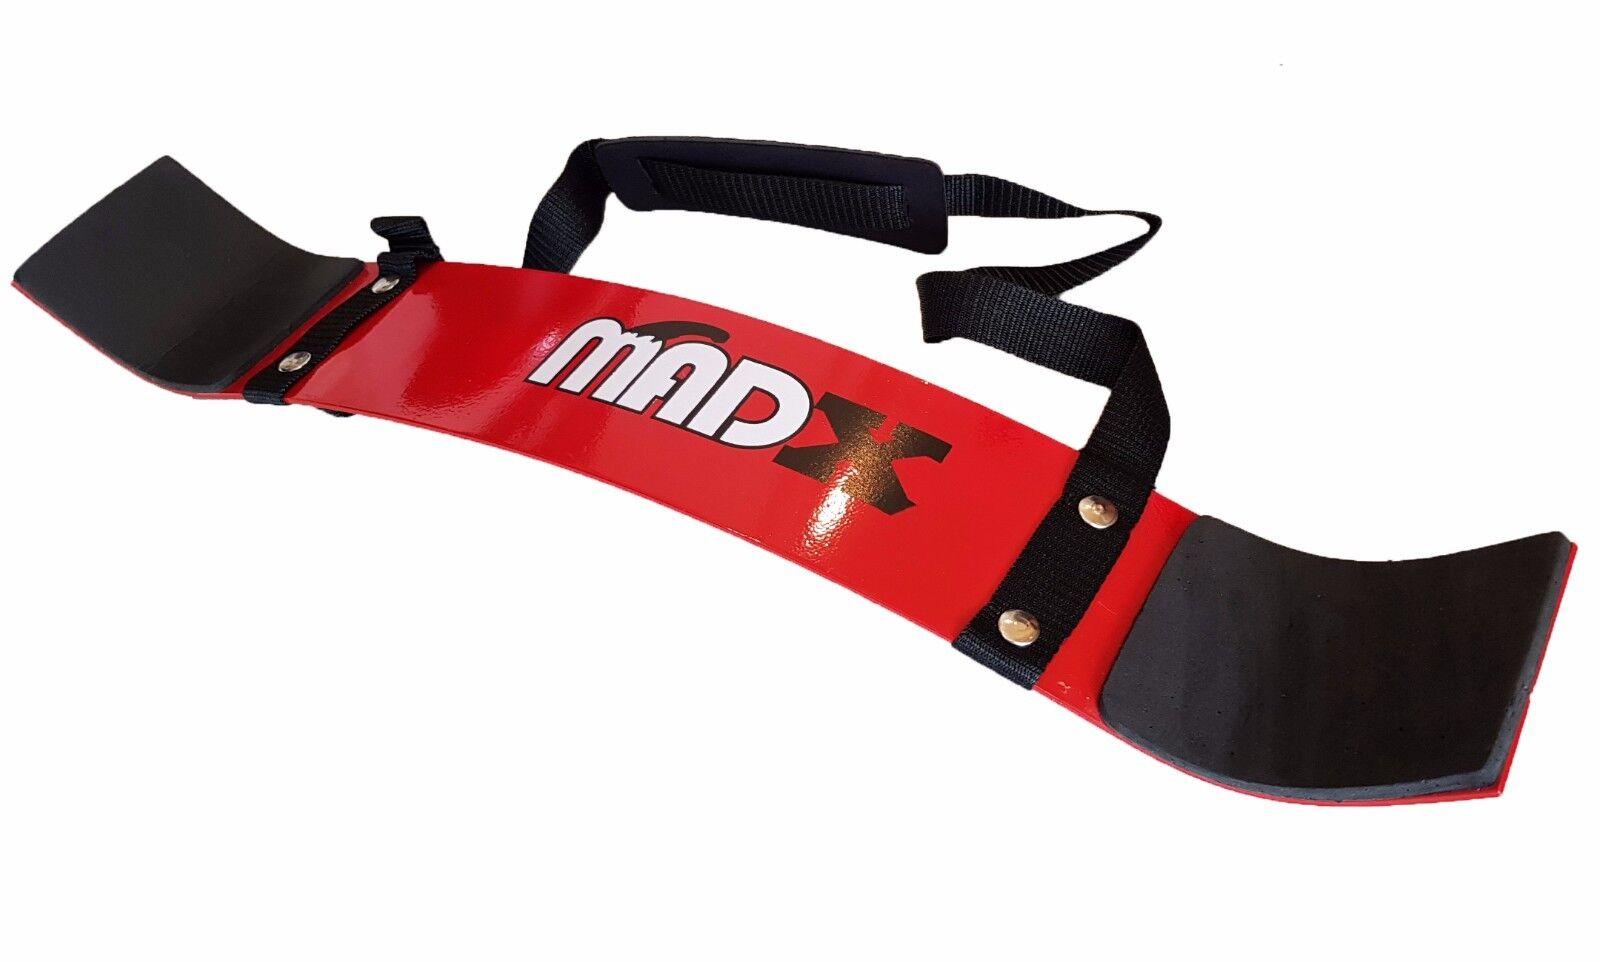 MADX Fitness Biceps Isolateur armes Blaster Arm Bomber Poids Erse de levage